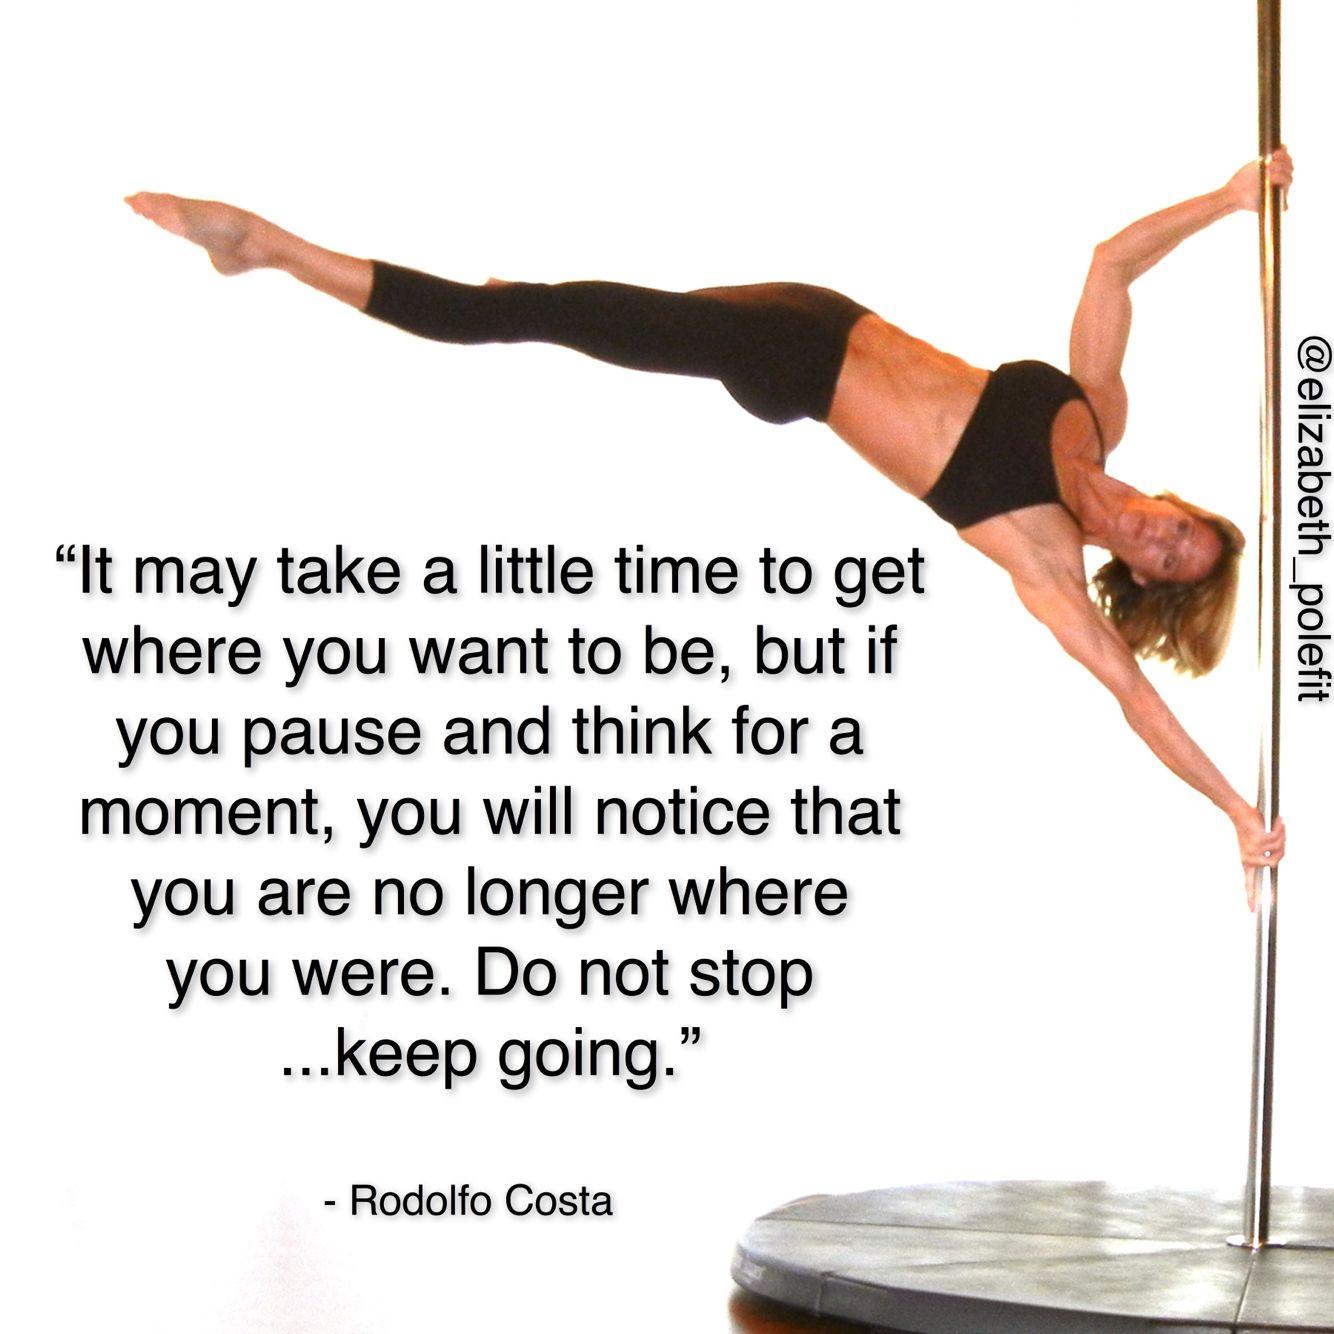 Do Not Stop Keep Going Rodolfo Costa Pole Dancing Quotes Pole Fitness Pole Dancing Fitness